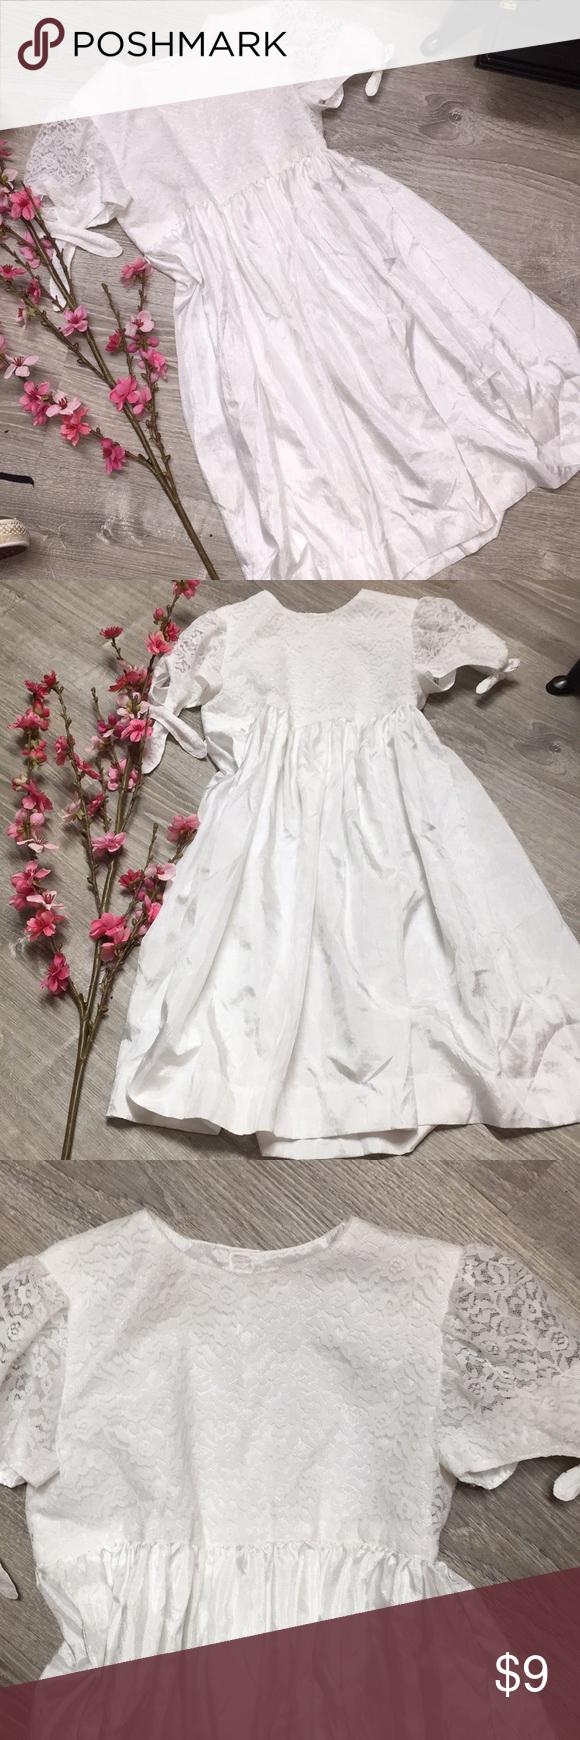 Girls Lace And Satin White Dress 4t White Dress Pretty Little Girls Dresses [ 1740 x 580 Pixel ]